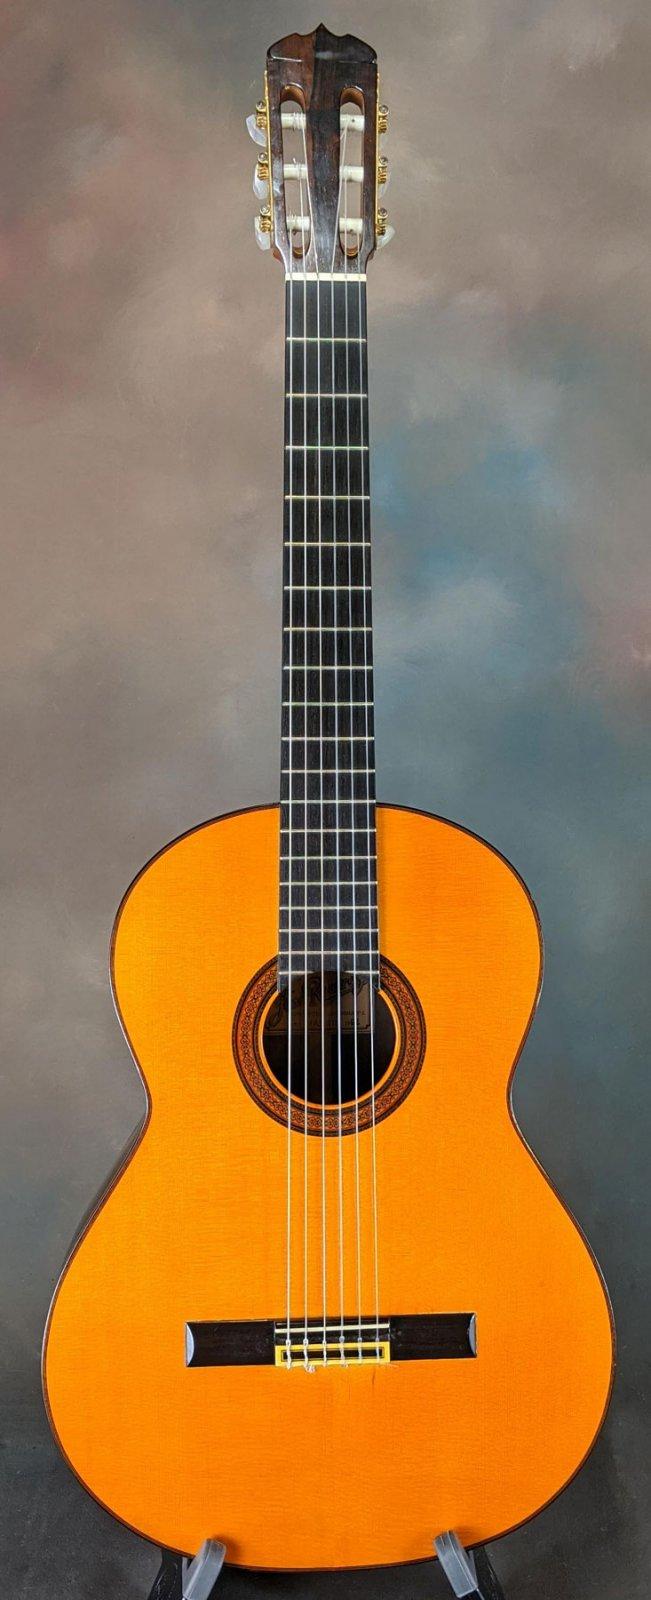 1962 Ramirez 1A Classical